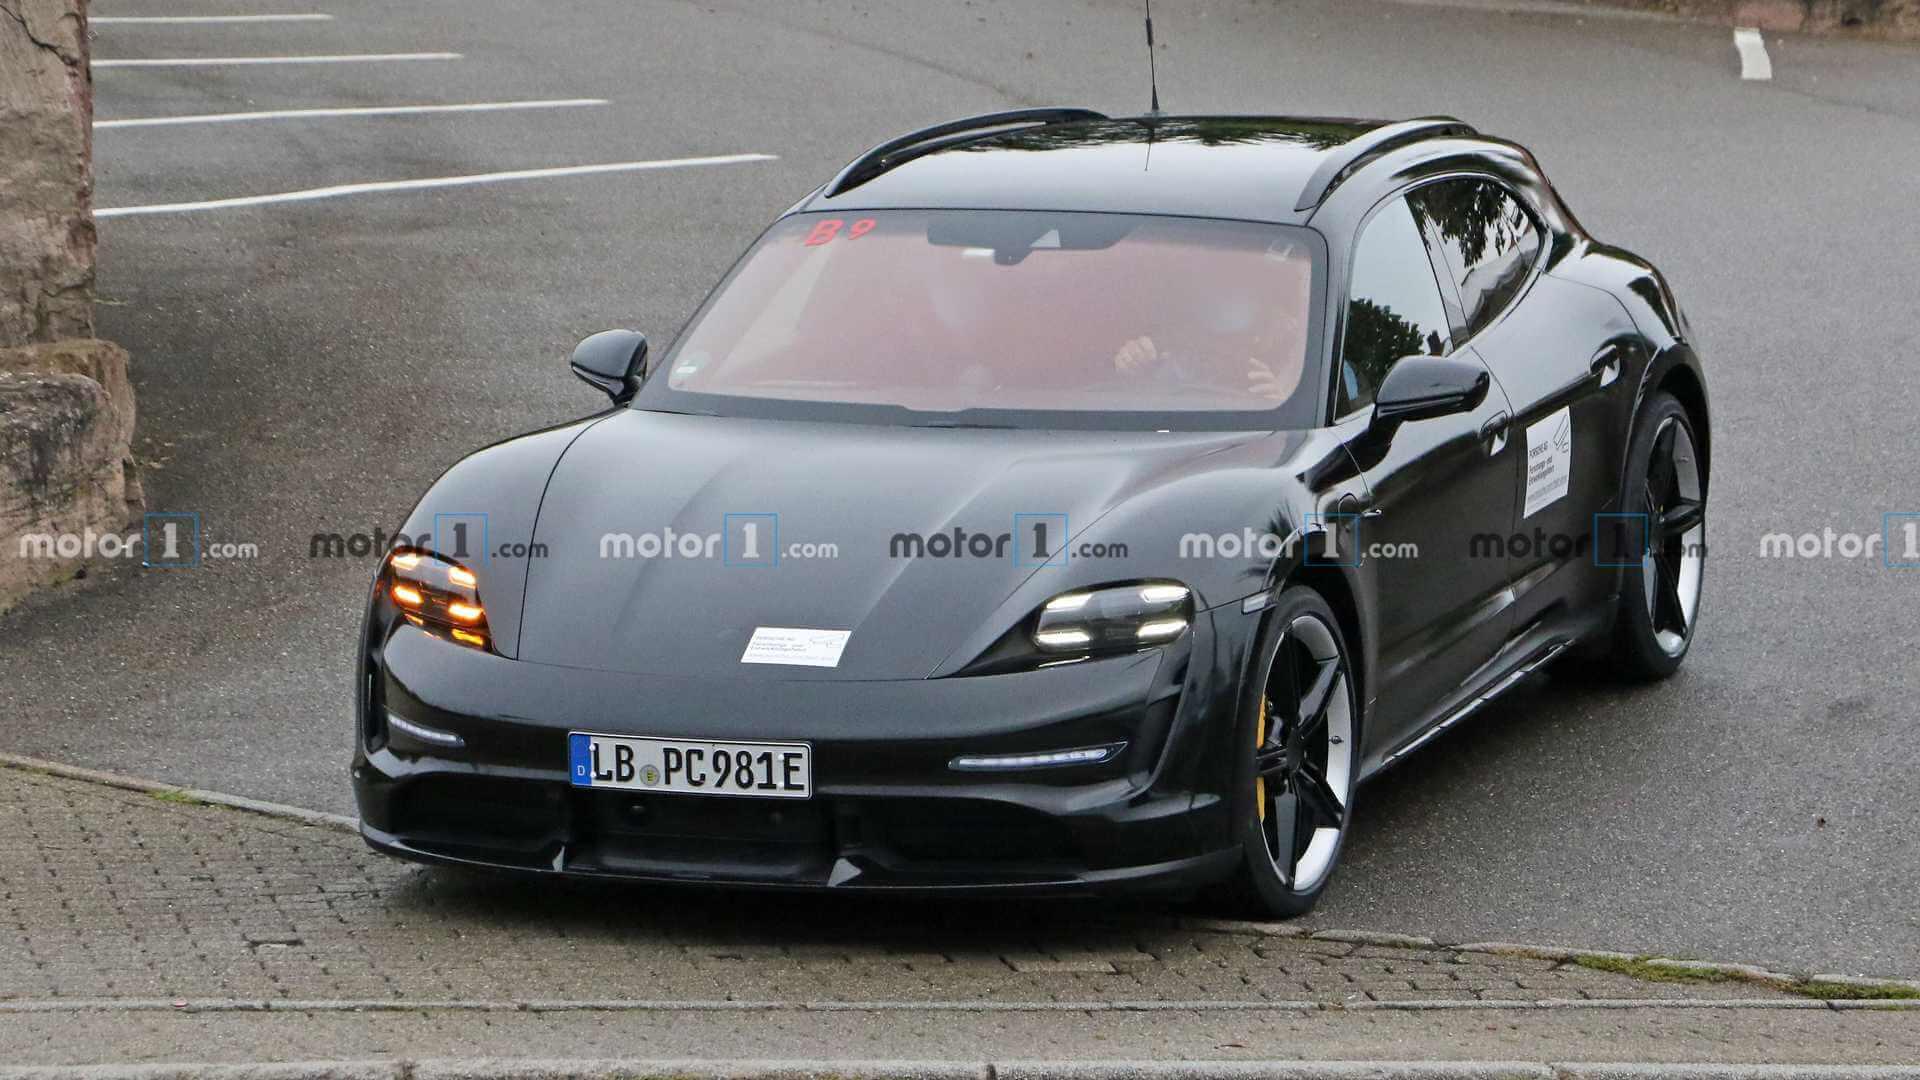 Porsche Taycan Cross Turismo 2021 года выпуска без камуфляжа